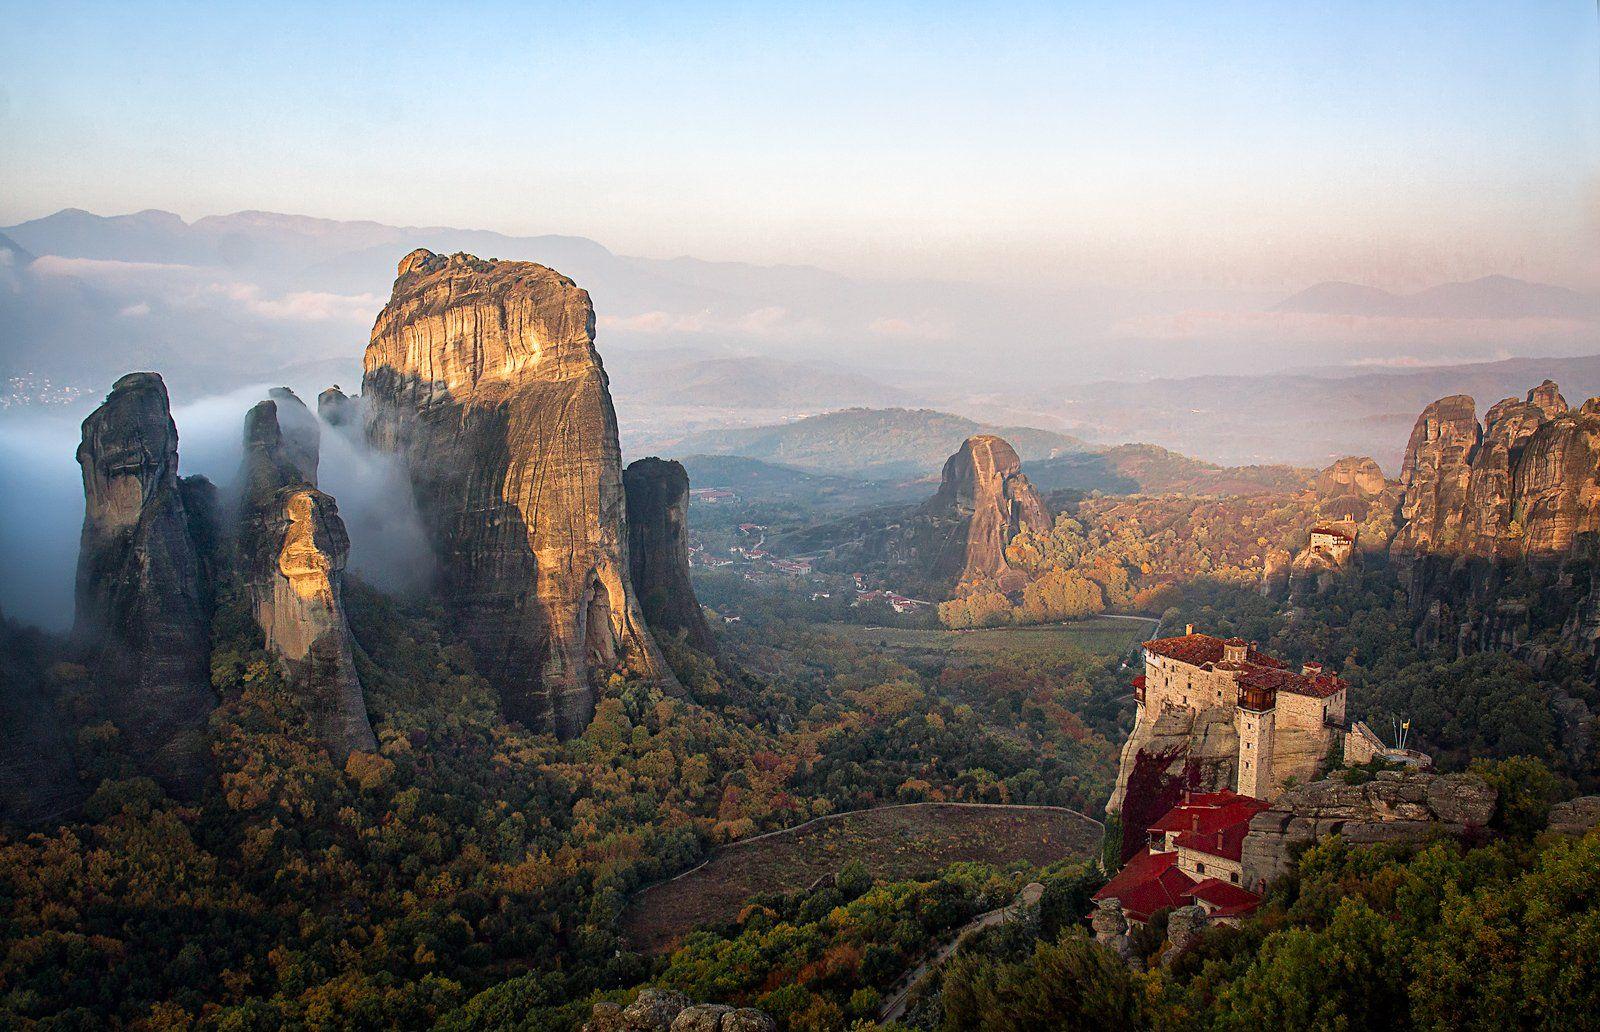 горы, туман, утро, метеоры, пейзаж,, Tatyana Forever